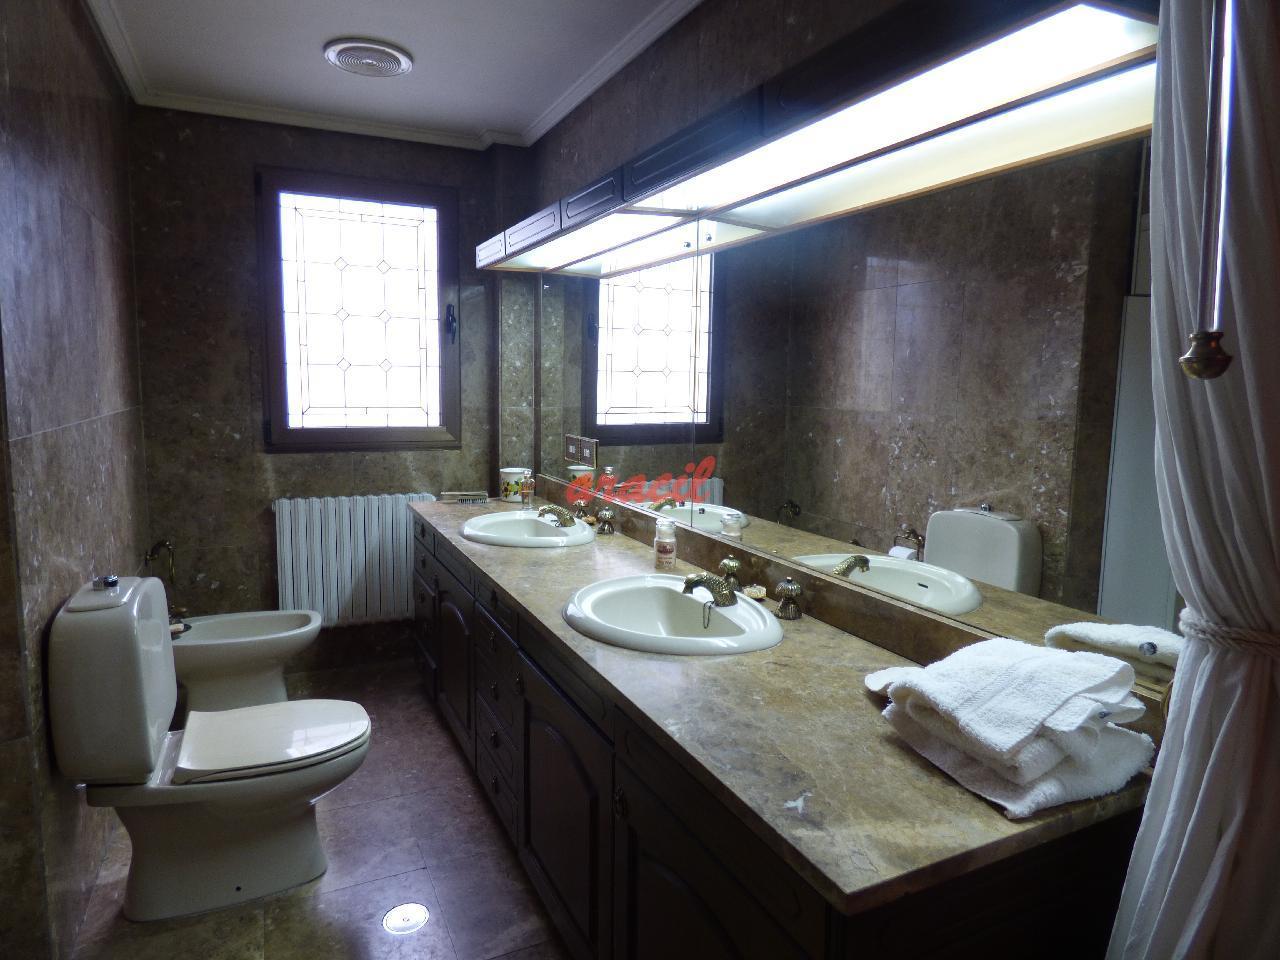 www.aracilinmobiliaria.com